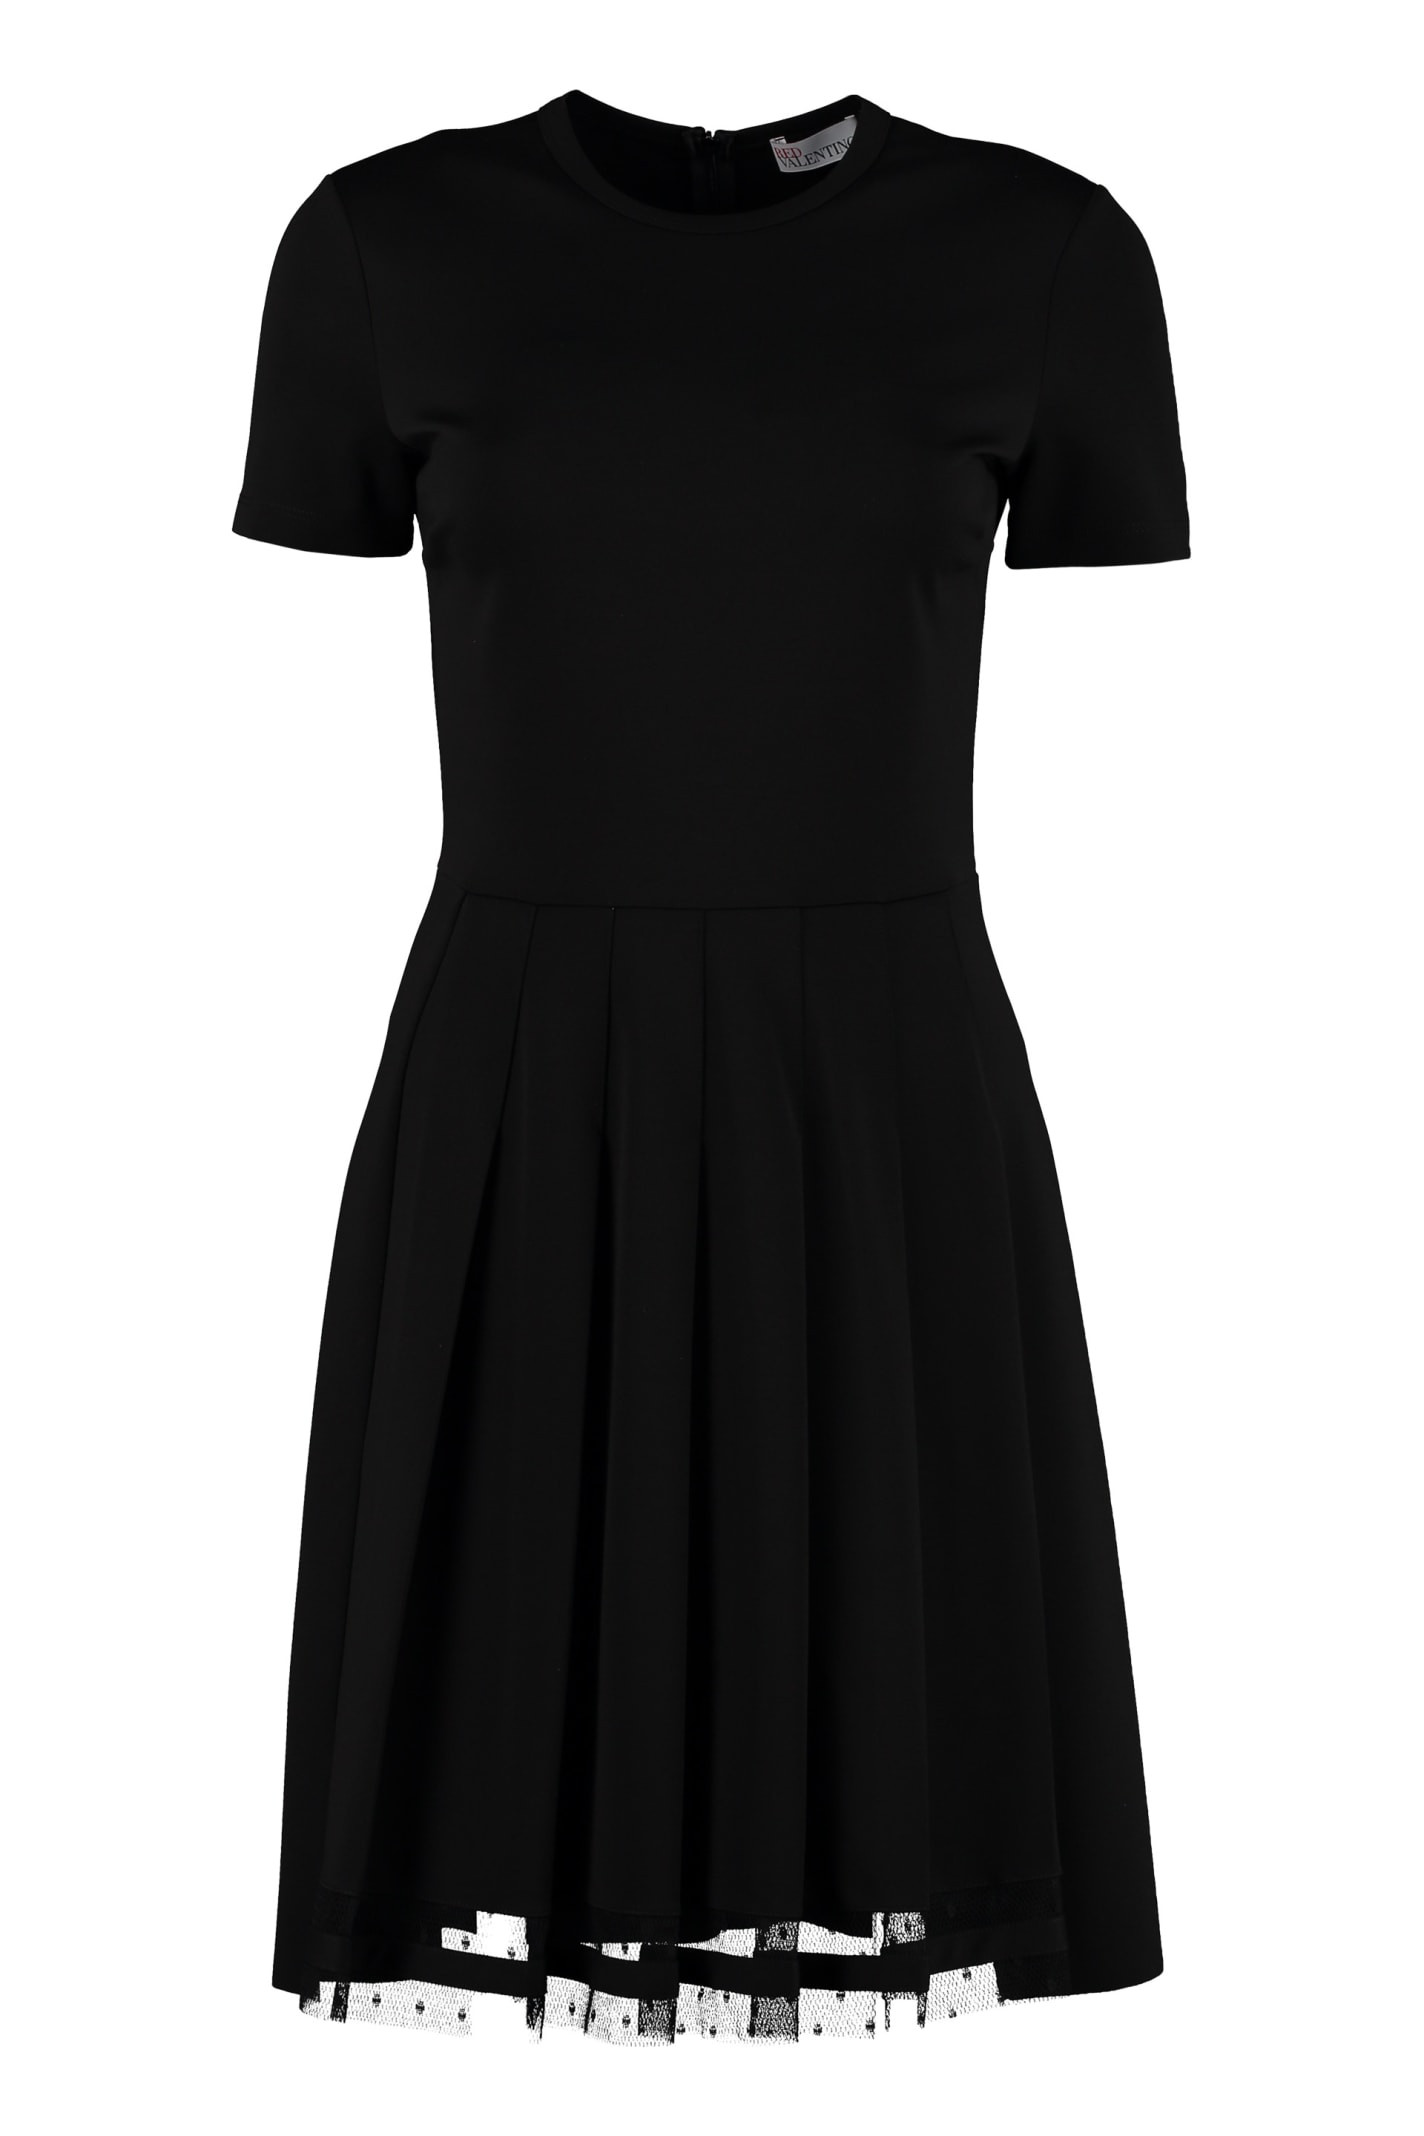 RED Valentino Pleated Skirt Dress